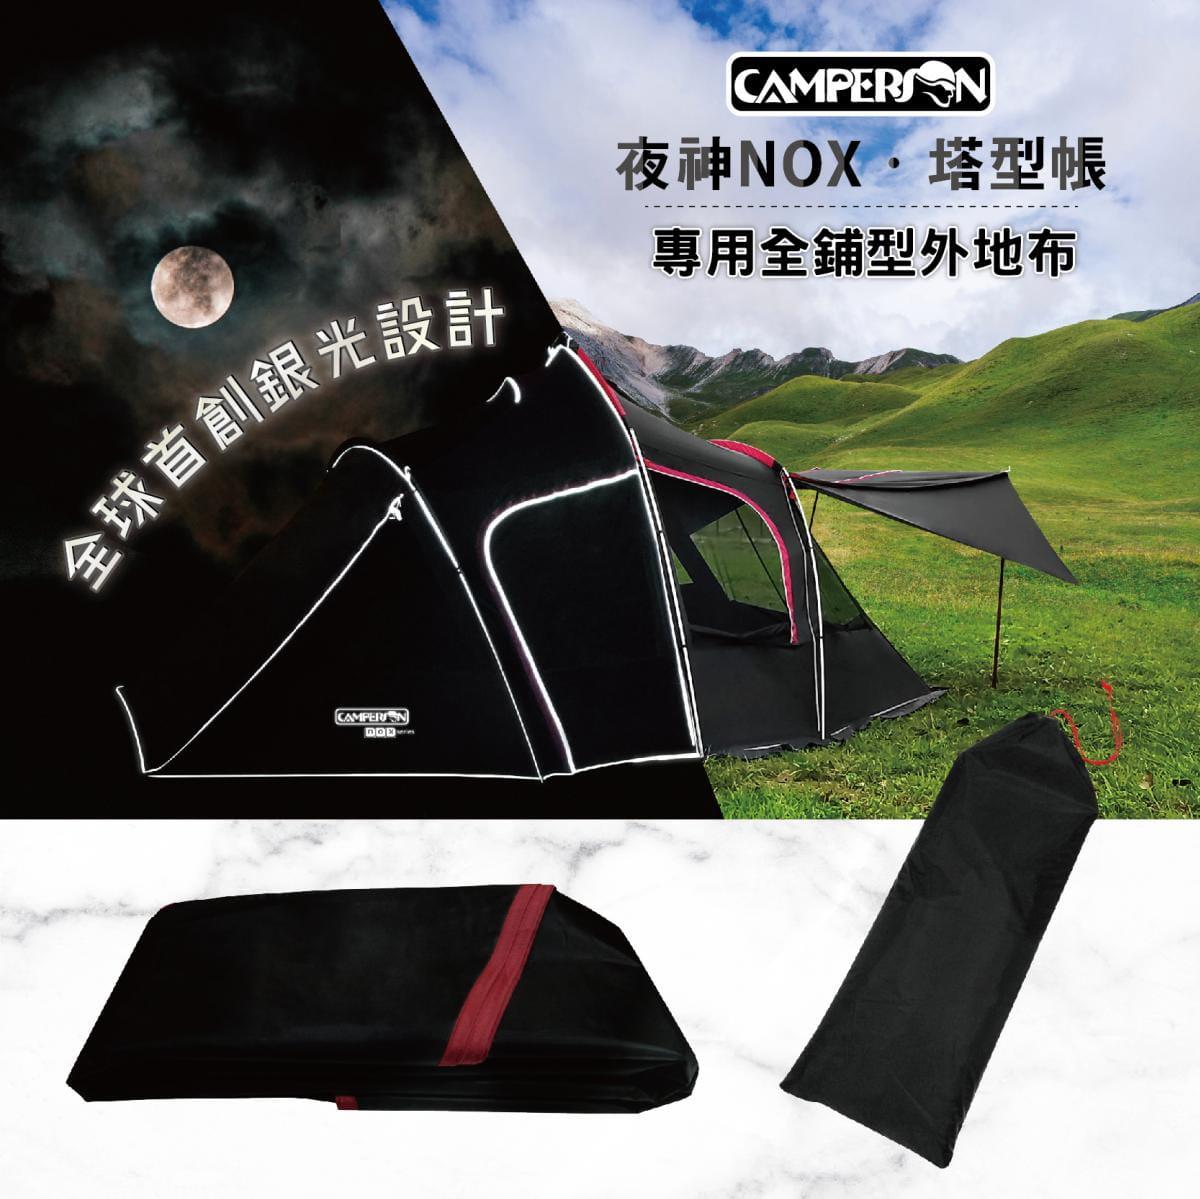 【CAMPERSON】夜神塔型帳用全舖型外地布 1